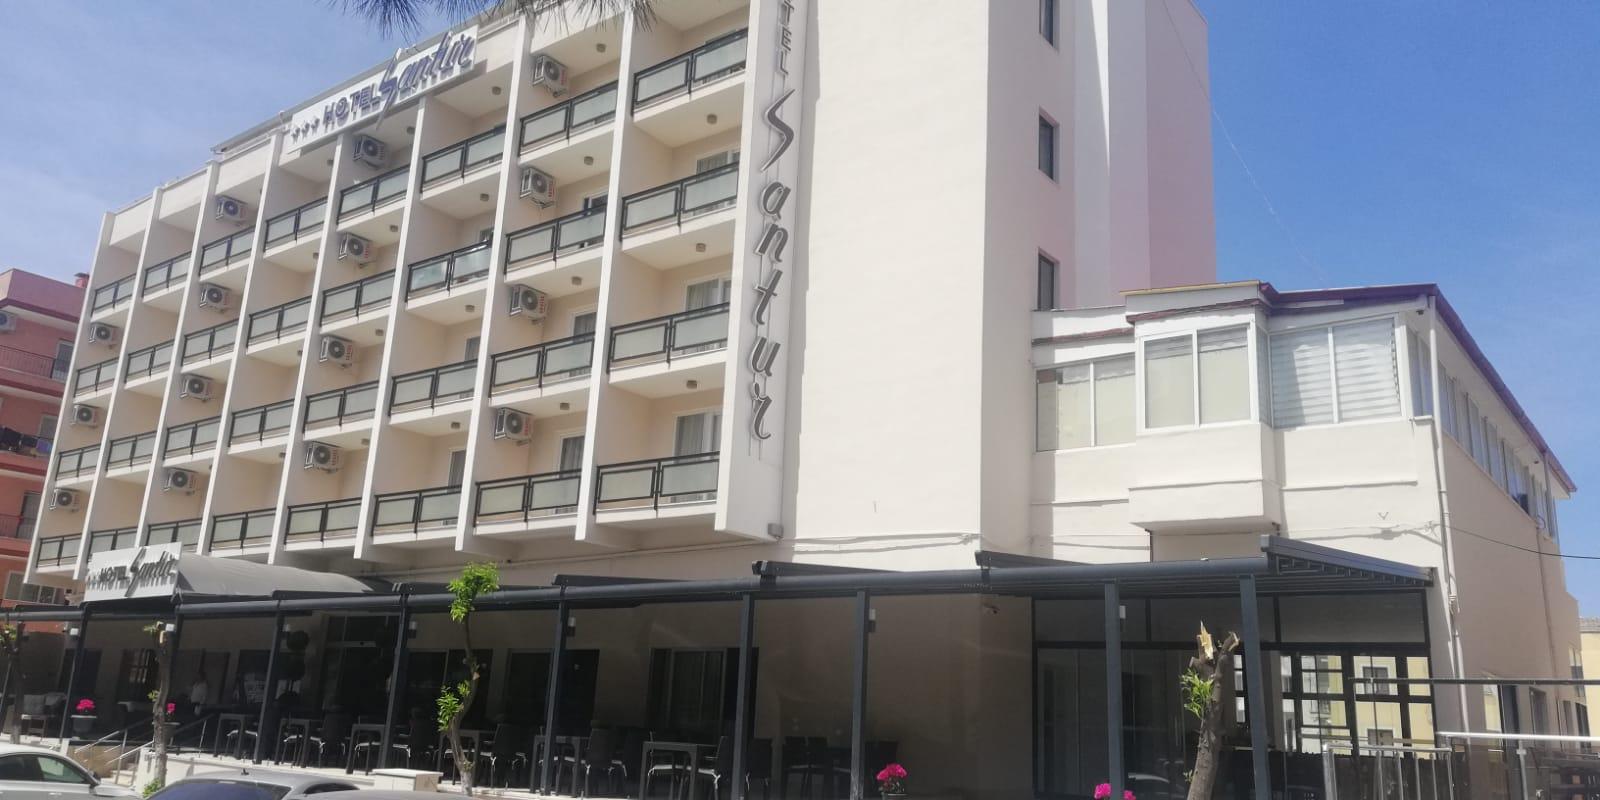 Letovanje Turska autobusom, Kusadasi, Hotel Santur,spolja